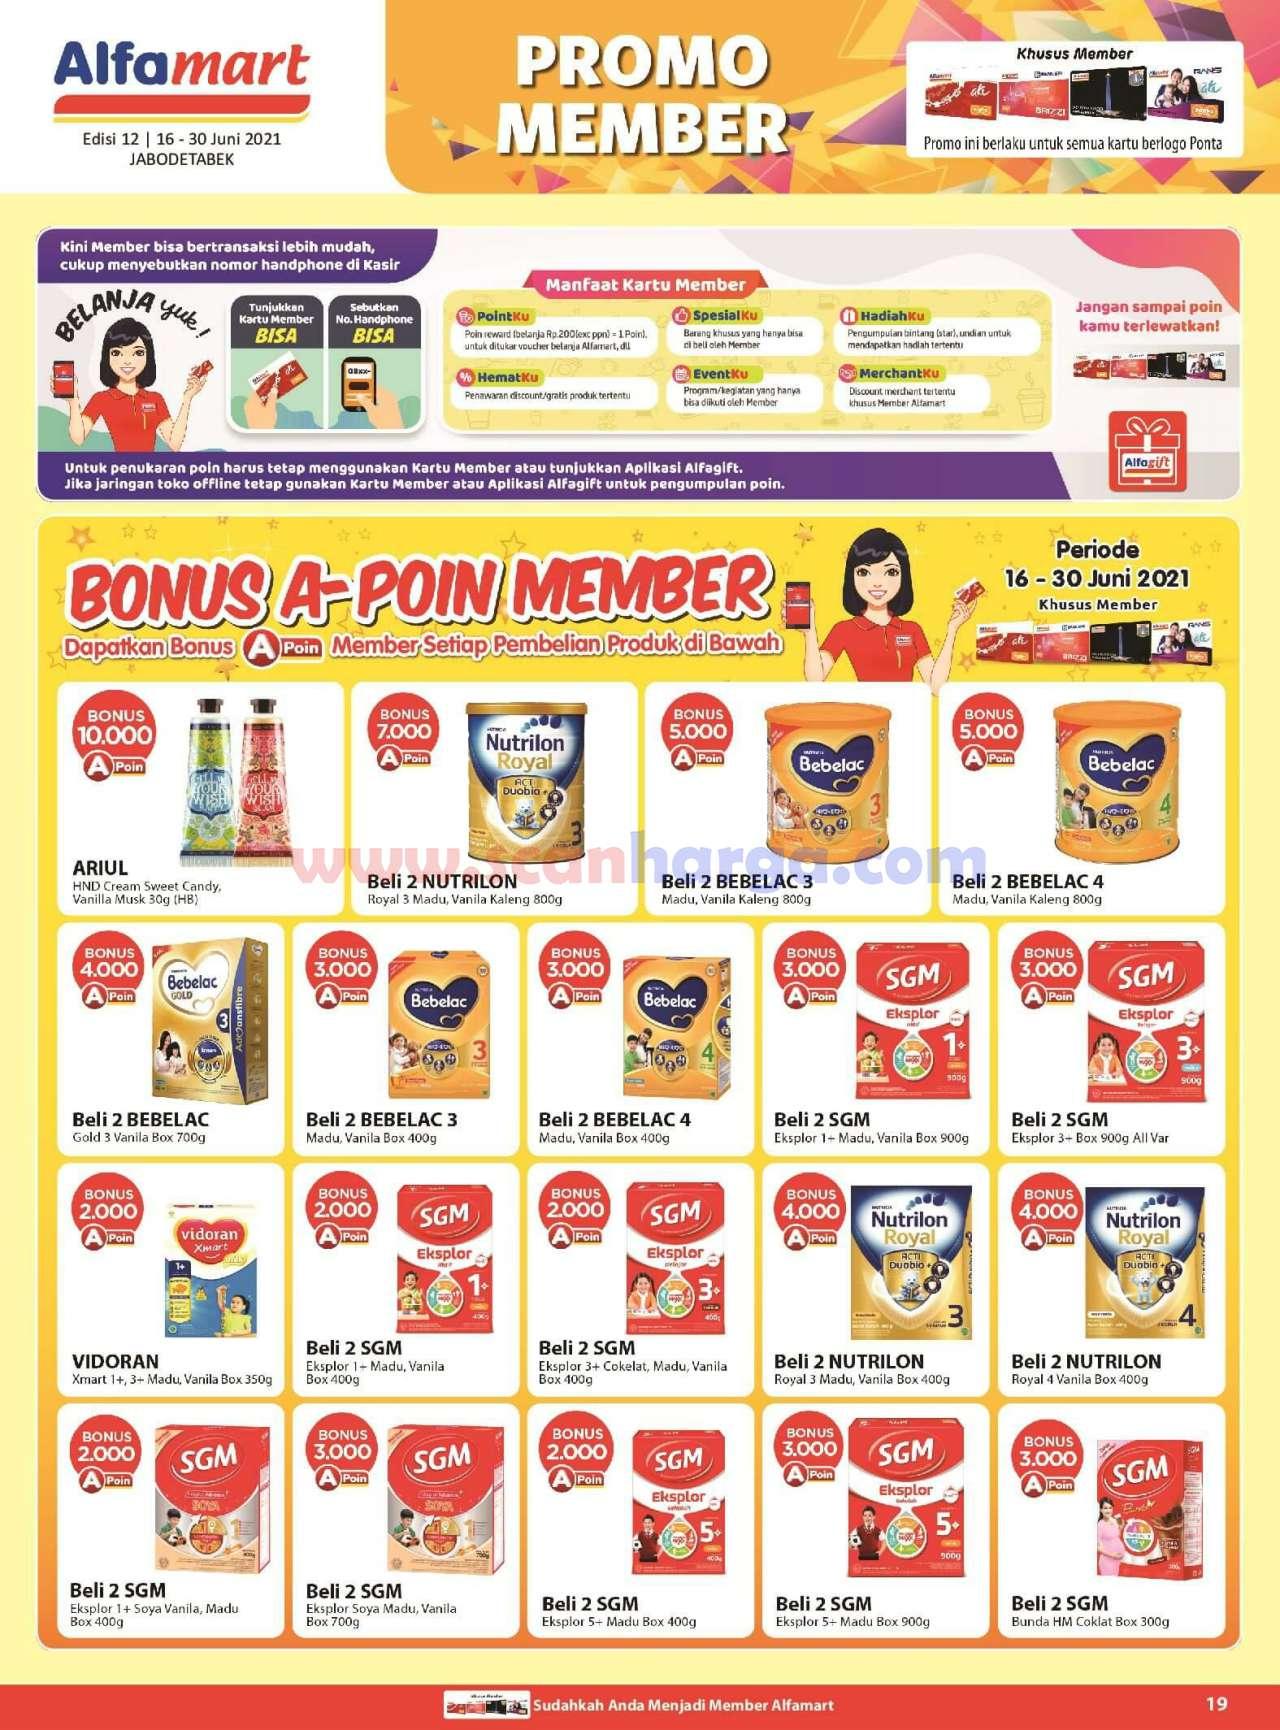 Katalog Promo Alfamart 16 - 30 Juni 2021 19